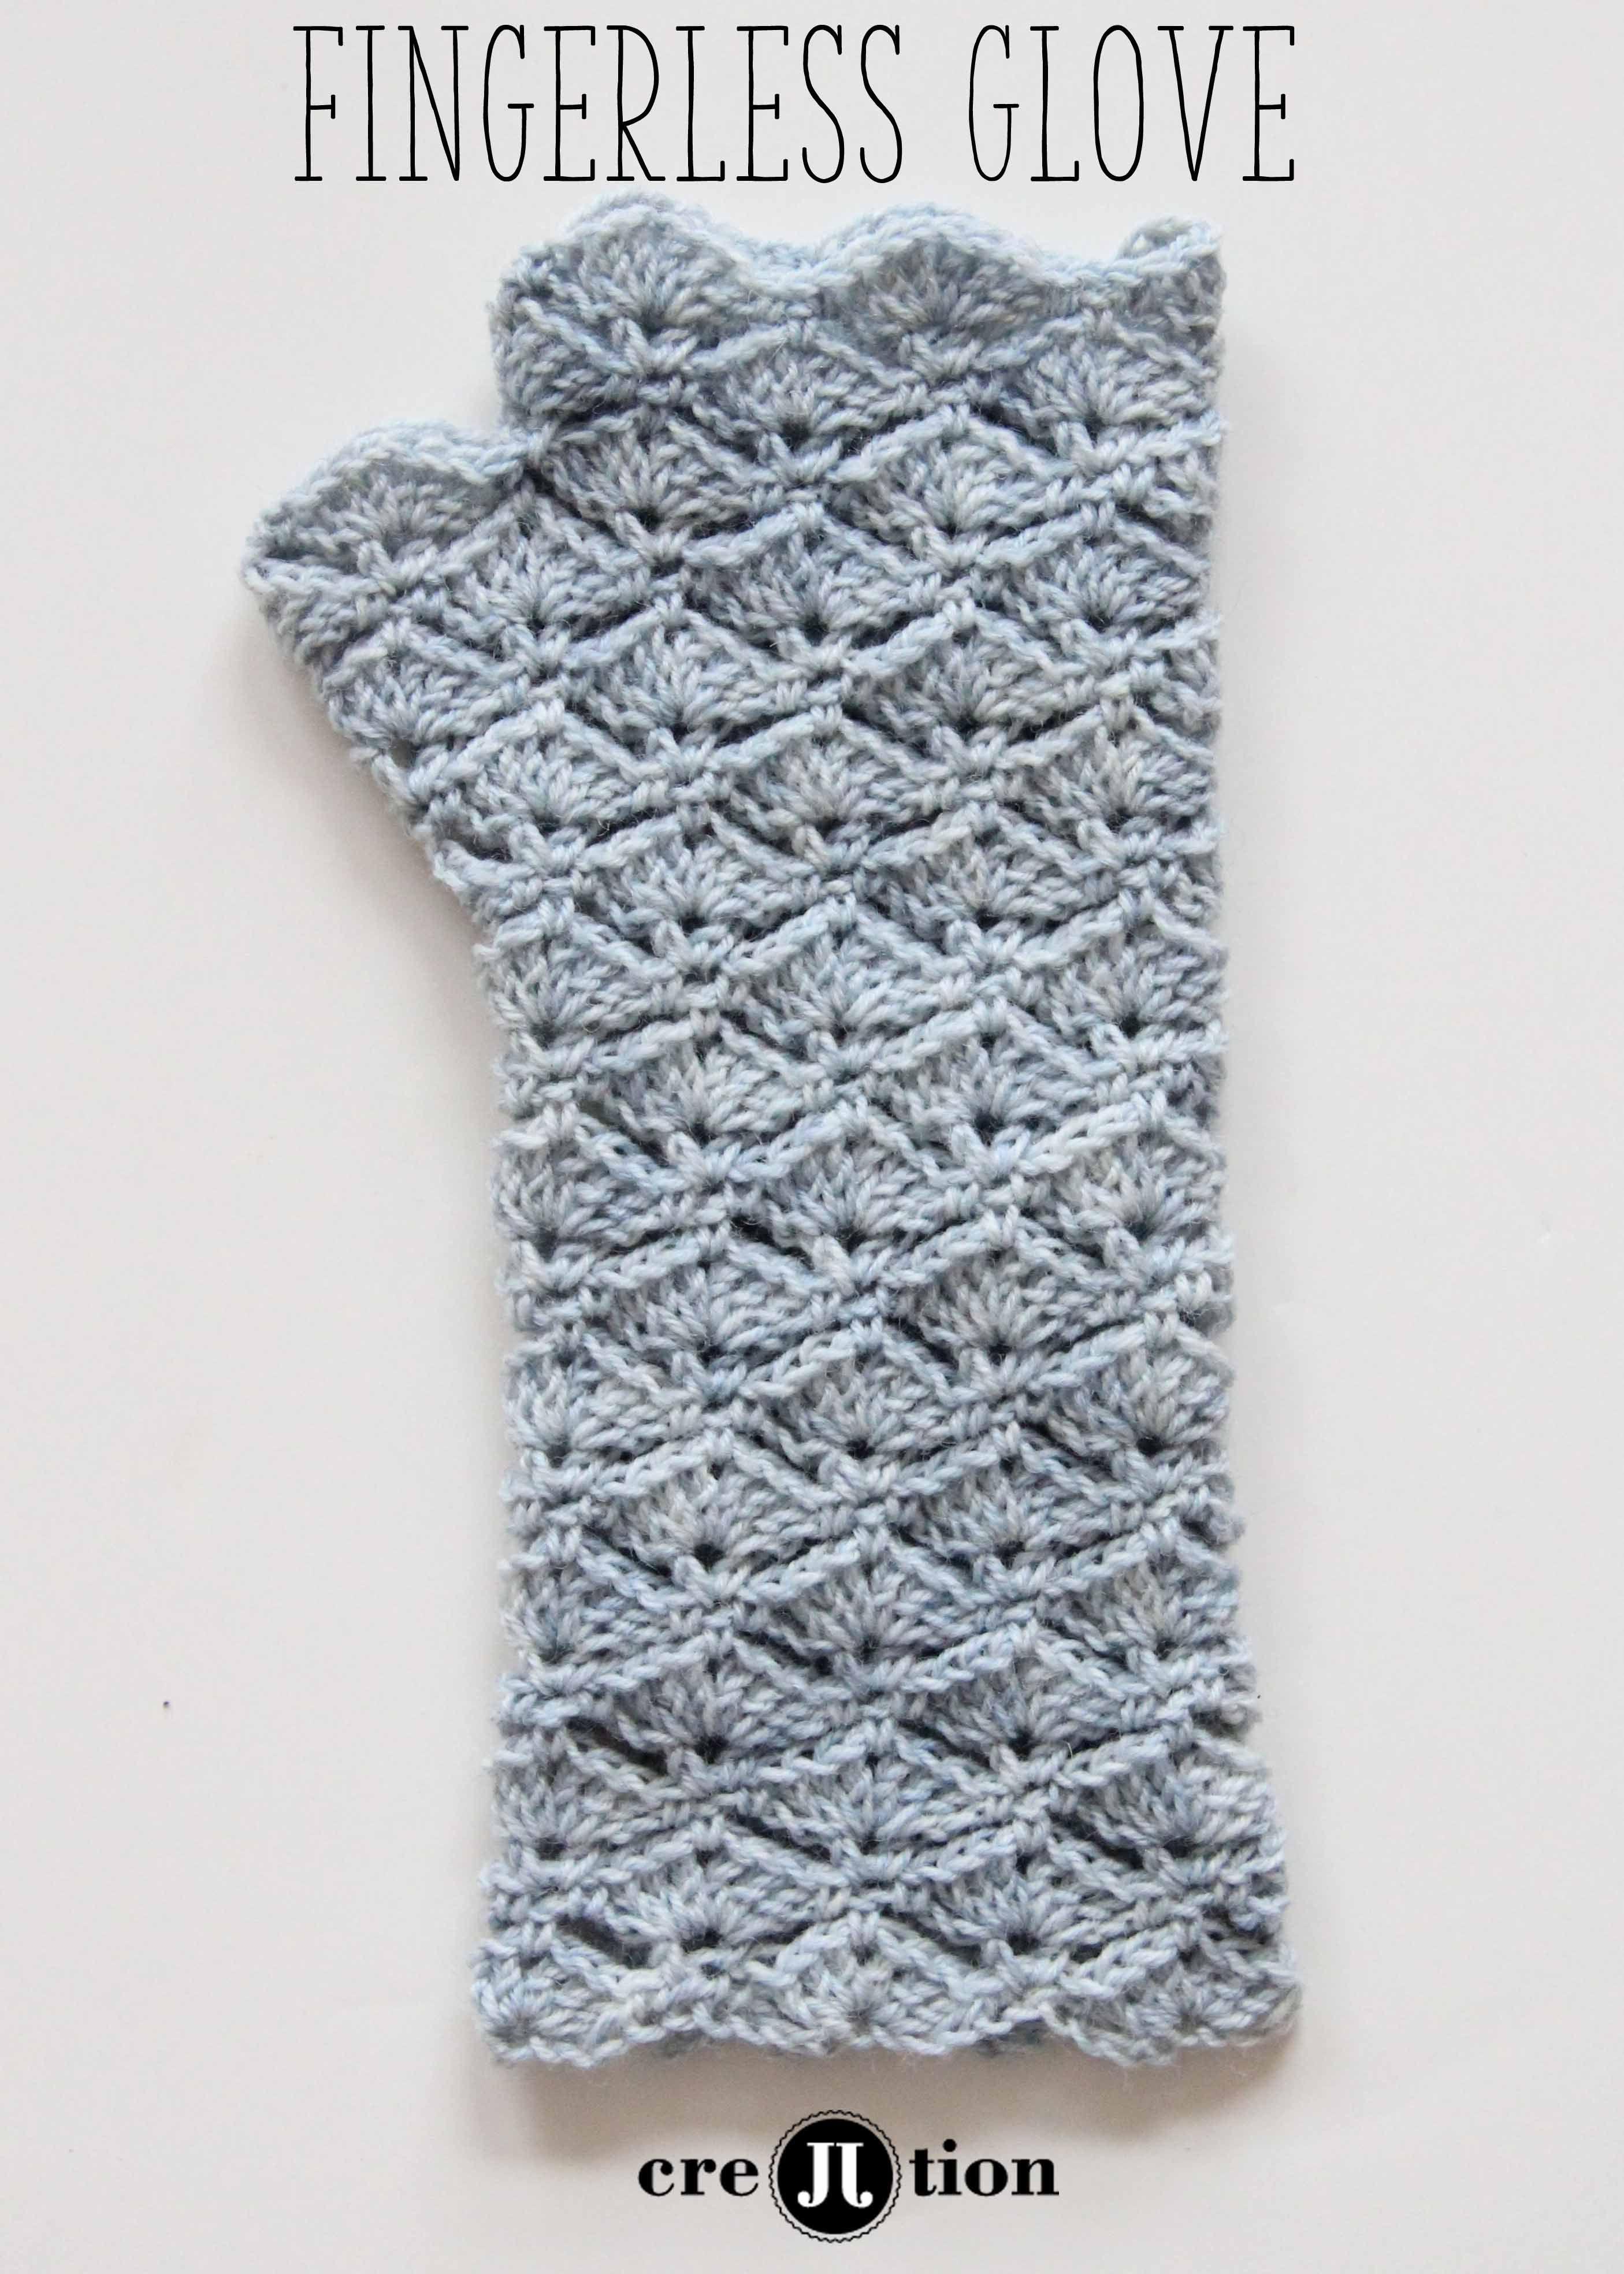 Crochet Figerless Glove - Tutorial 4U // hf http://www ...